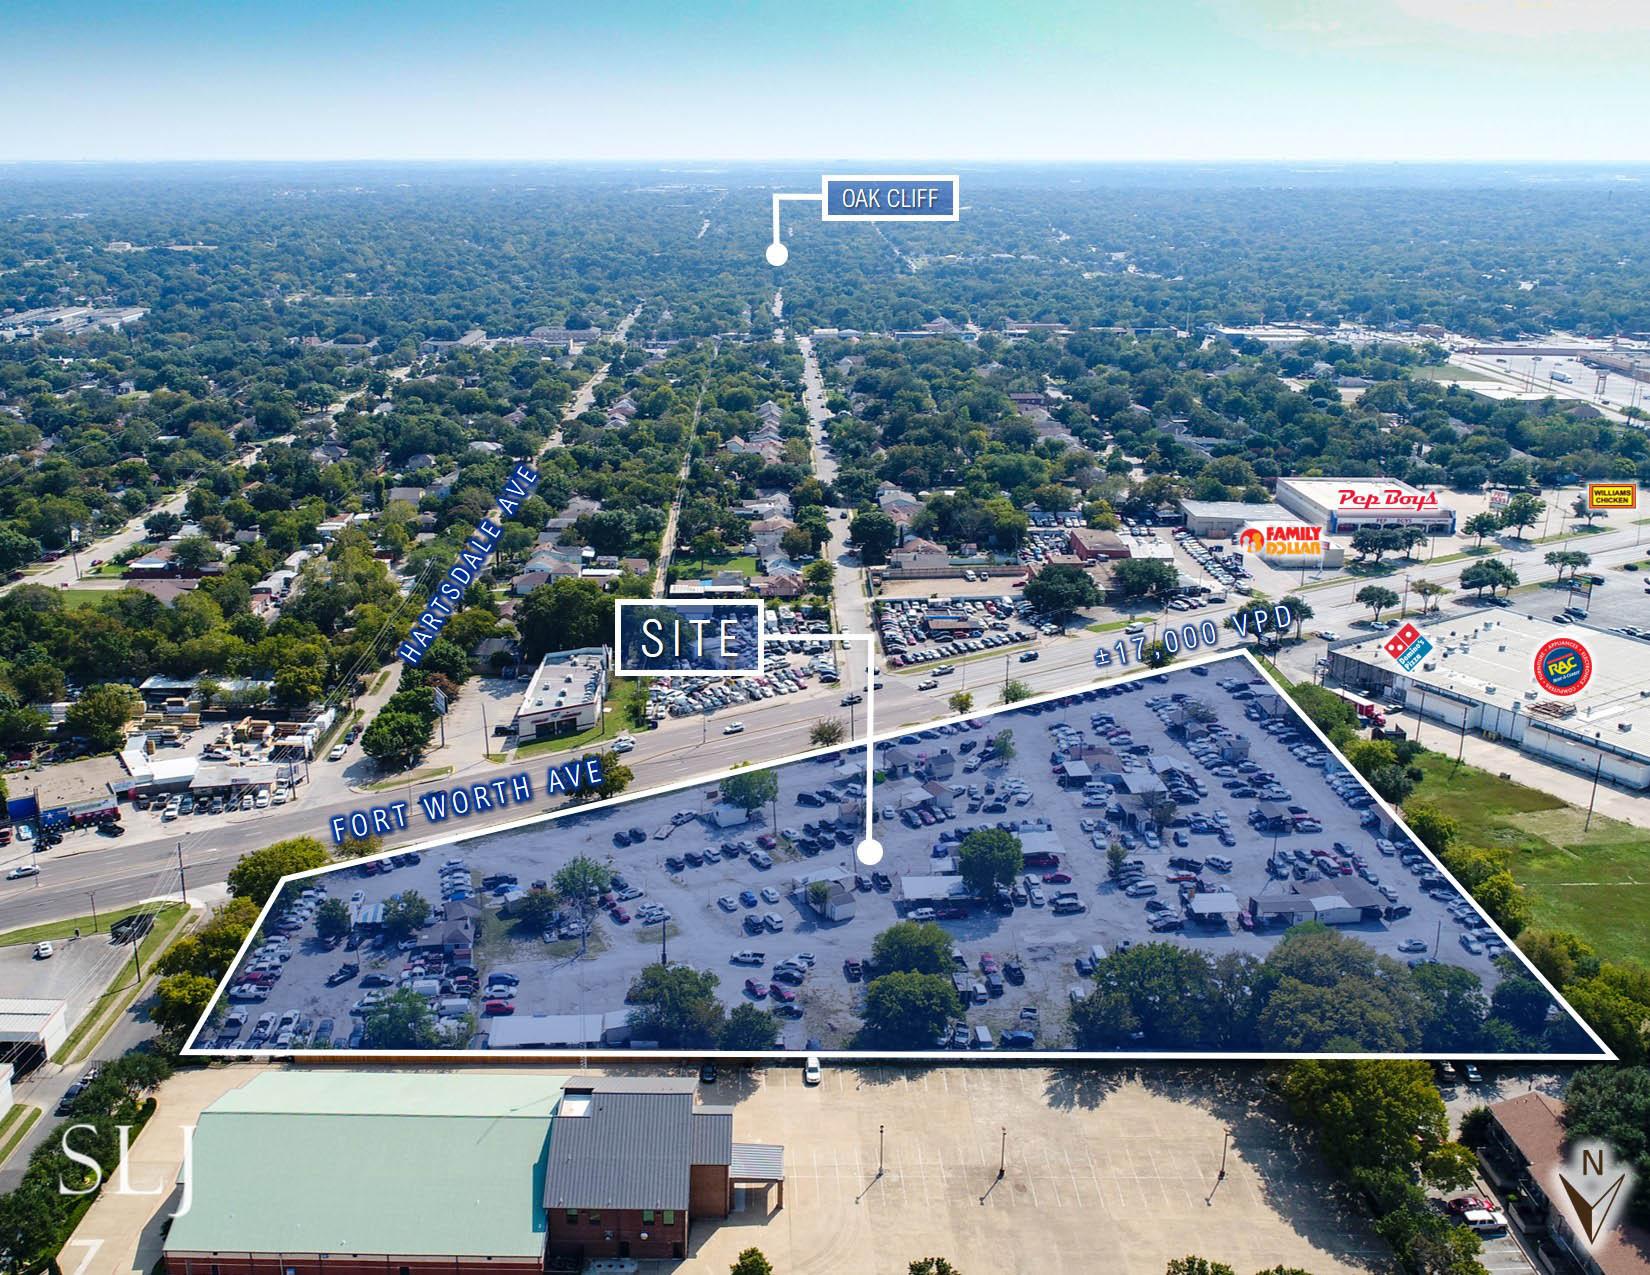 3007-3011 Fort Worth Ave, Dallas, TX